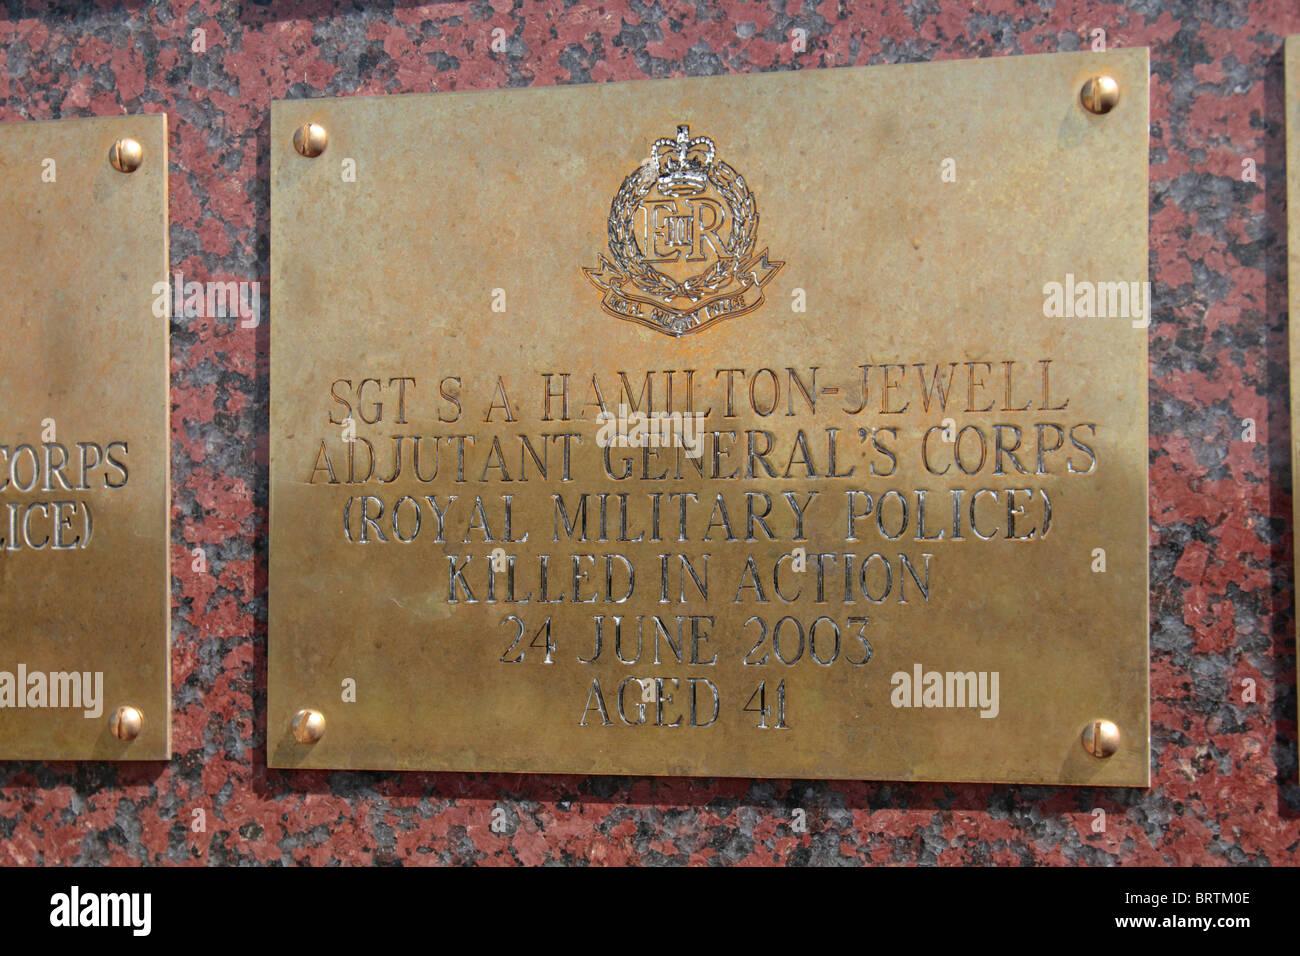 Name plate for Sgt SA Hamilton-Jewel, Royal Military Police on the Basra Memorial Wall, National Memorial Arboretum, - Stock Image